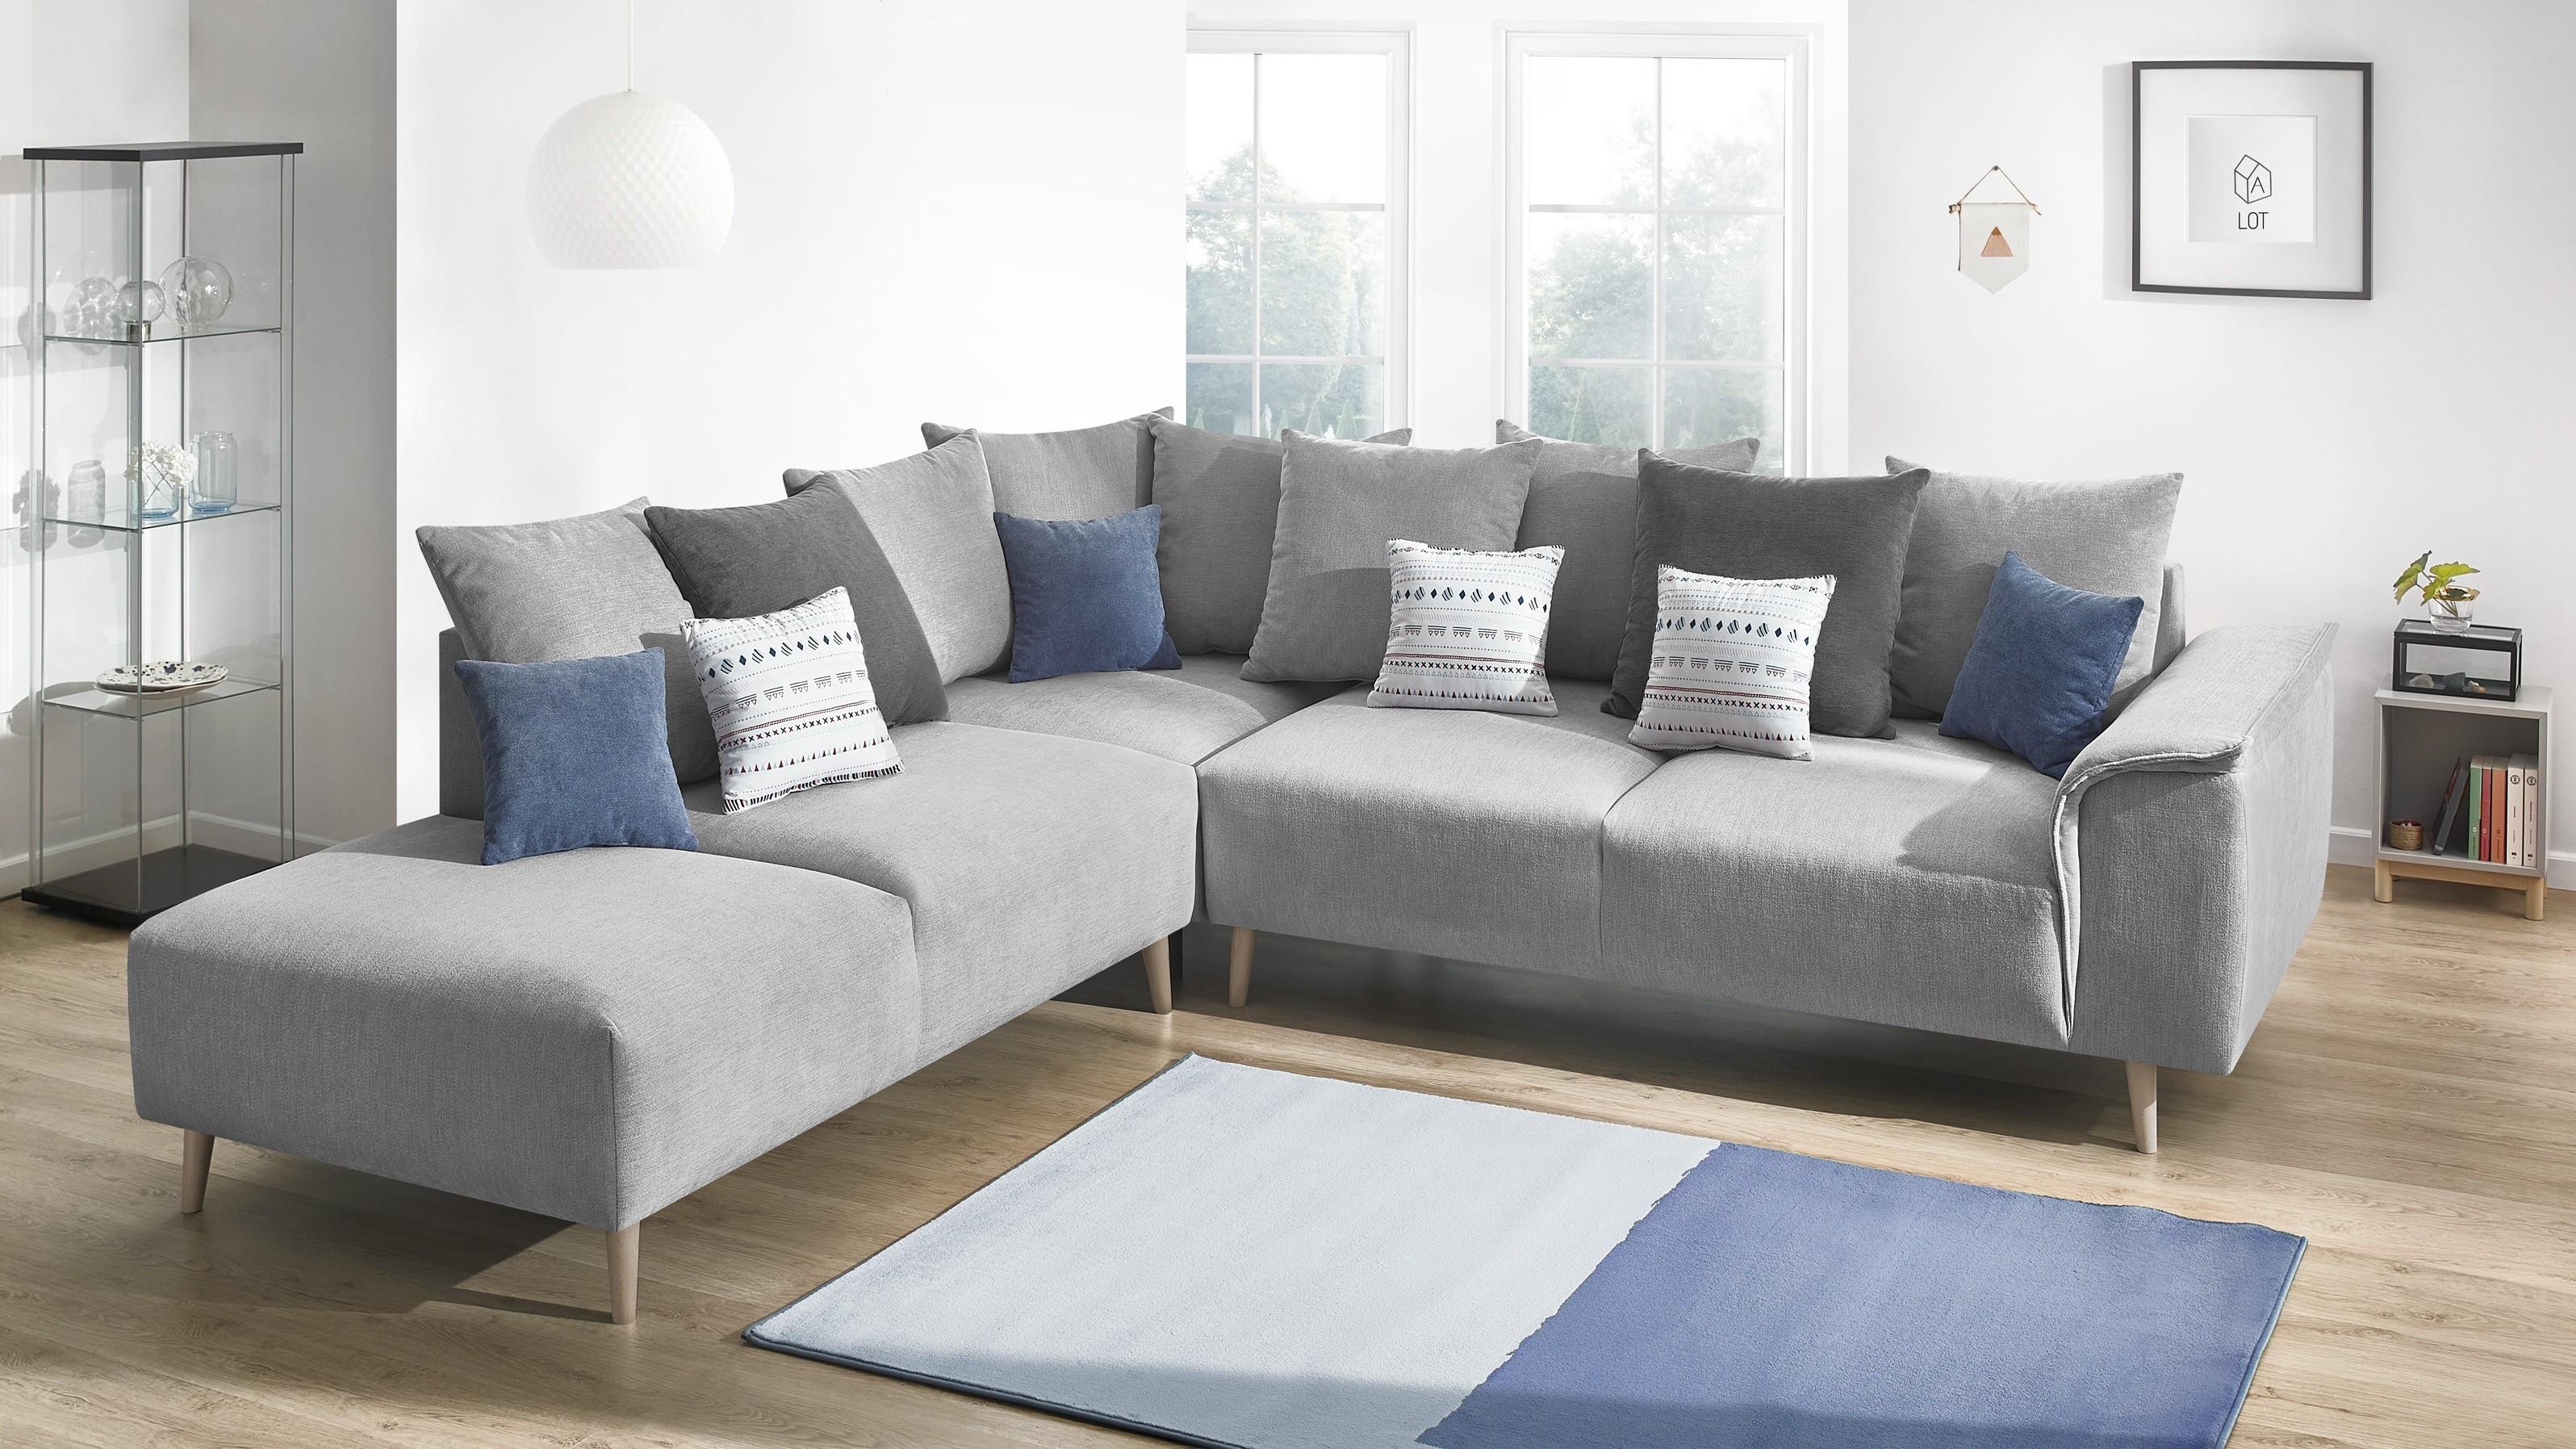 canap grand angle london bobochic. Black Bedroom Furniture Sets. Home Design Ideas